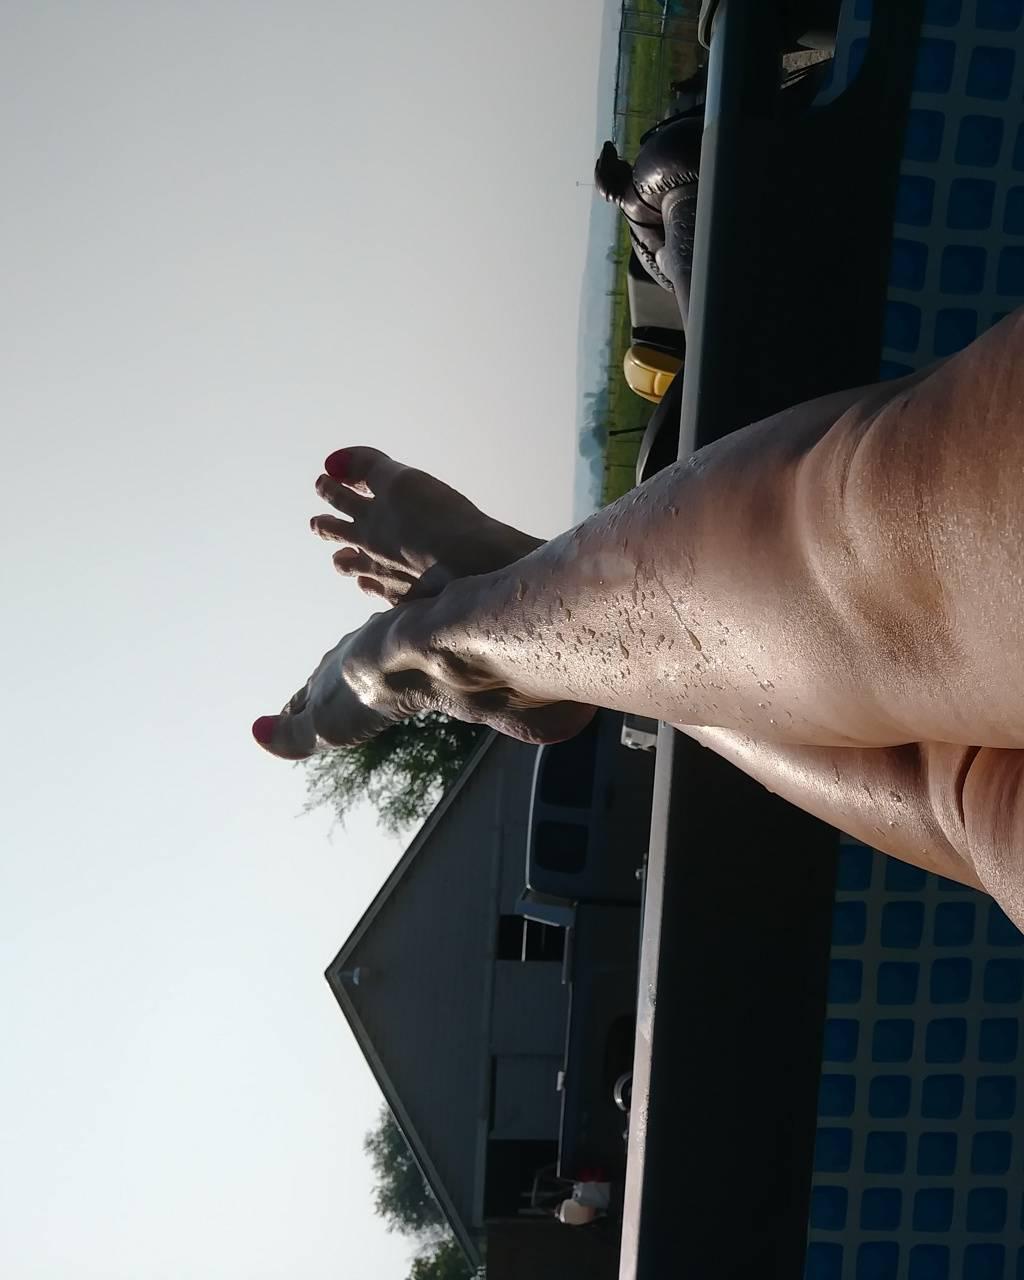 Swimming pool legs